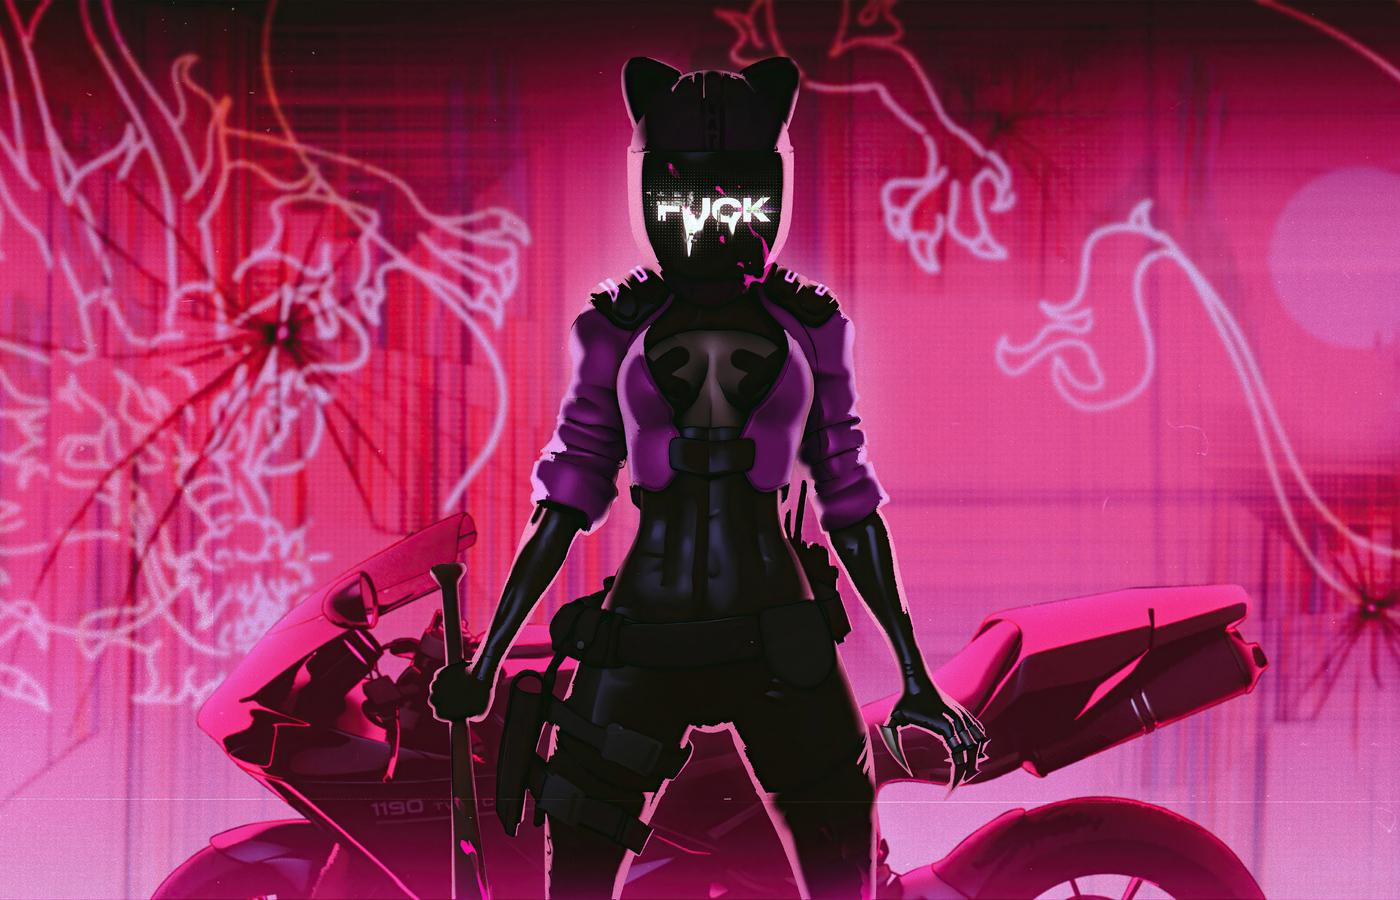 scifi-cat-member-biker-5k-uq.jpg